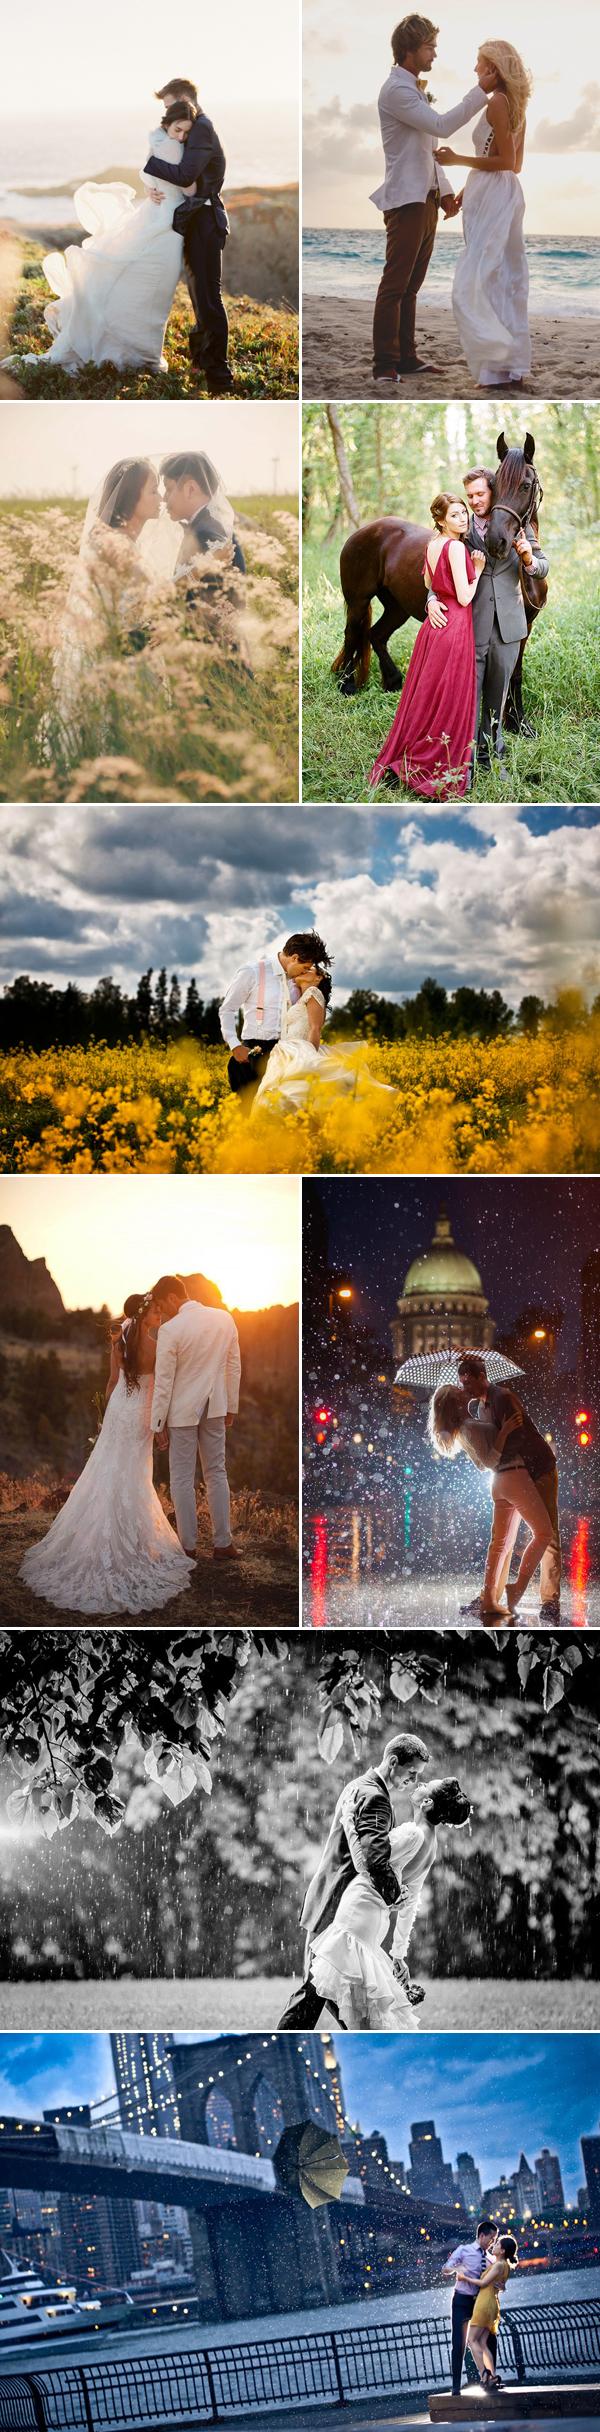 movieromantic02-dreamyromance